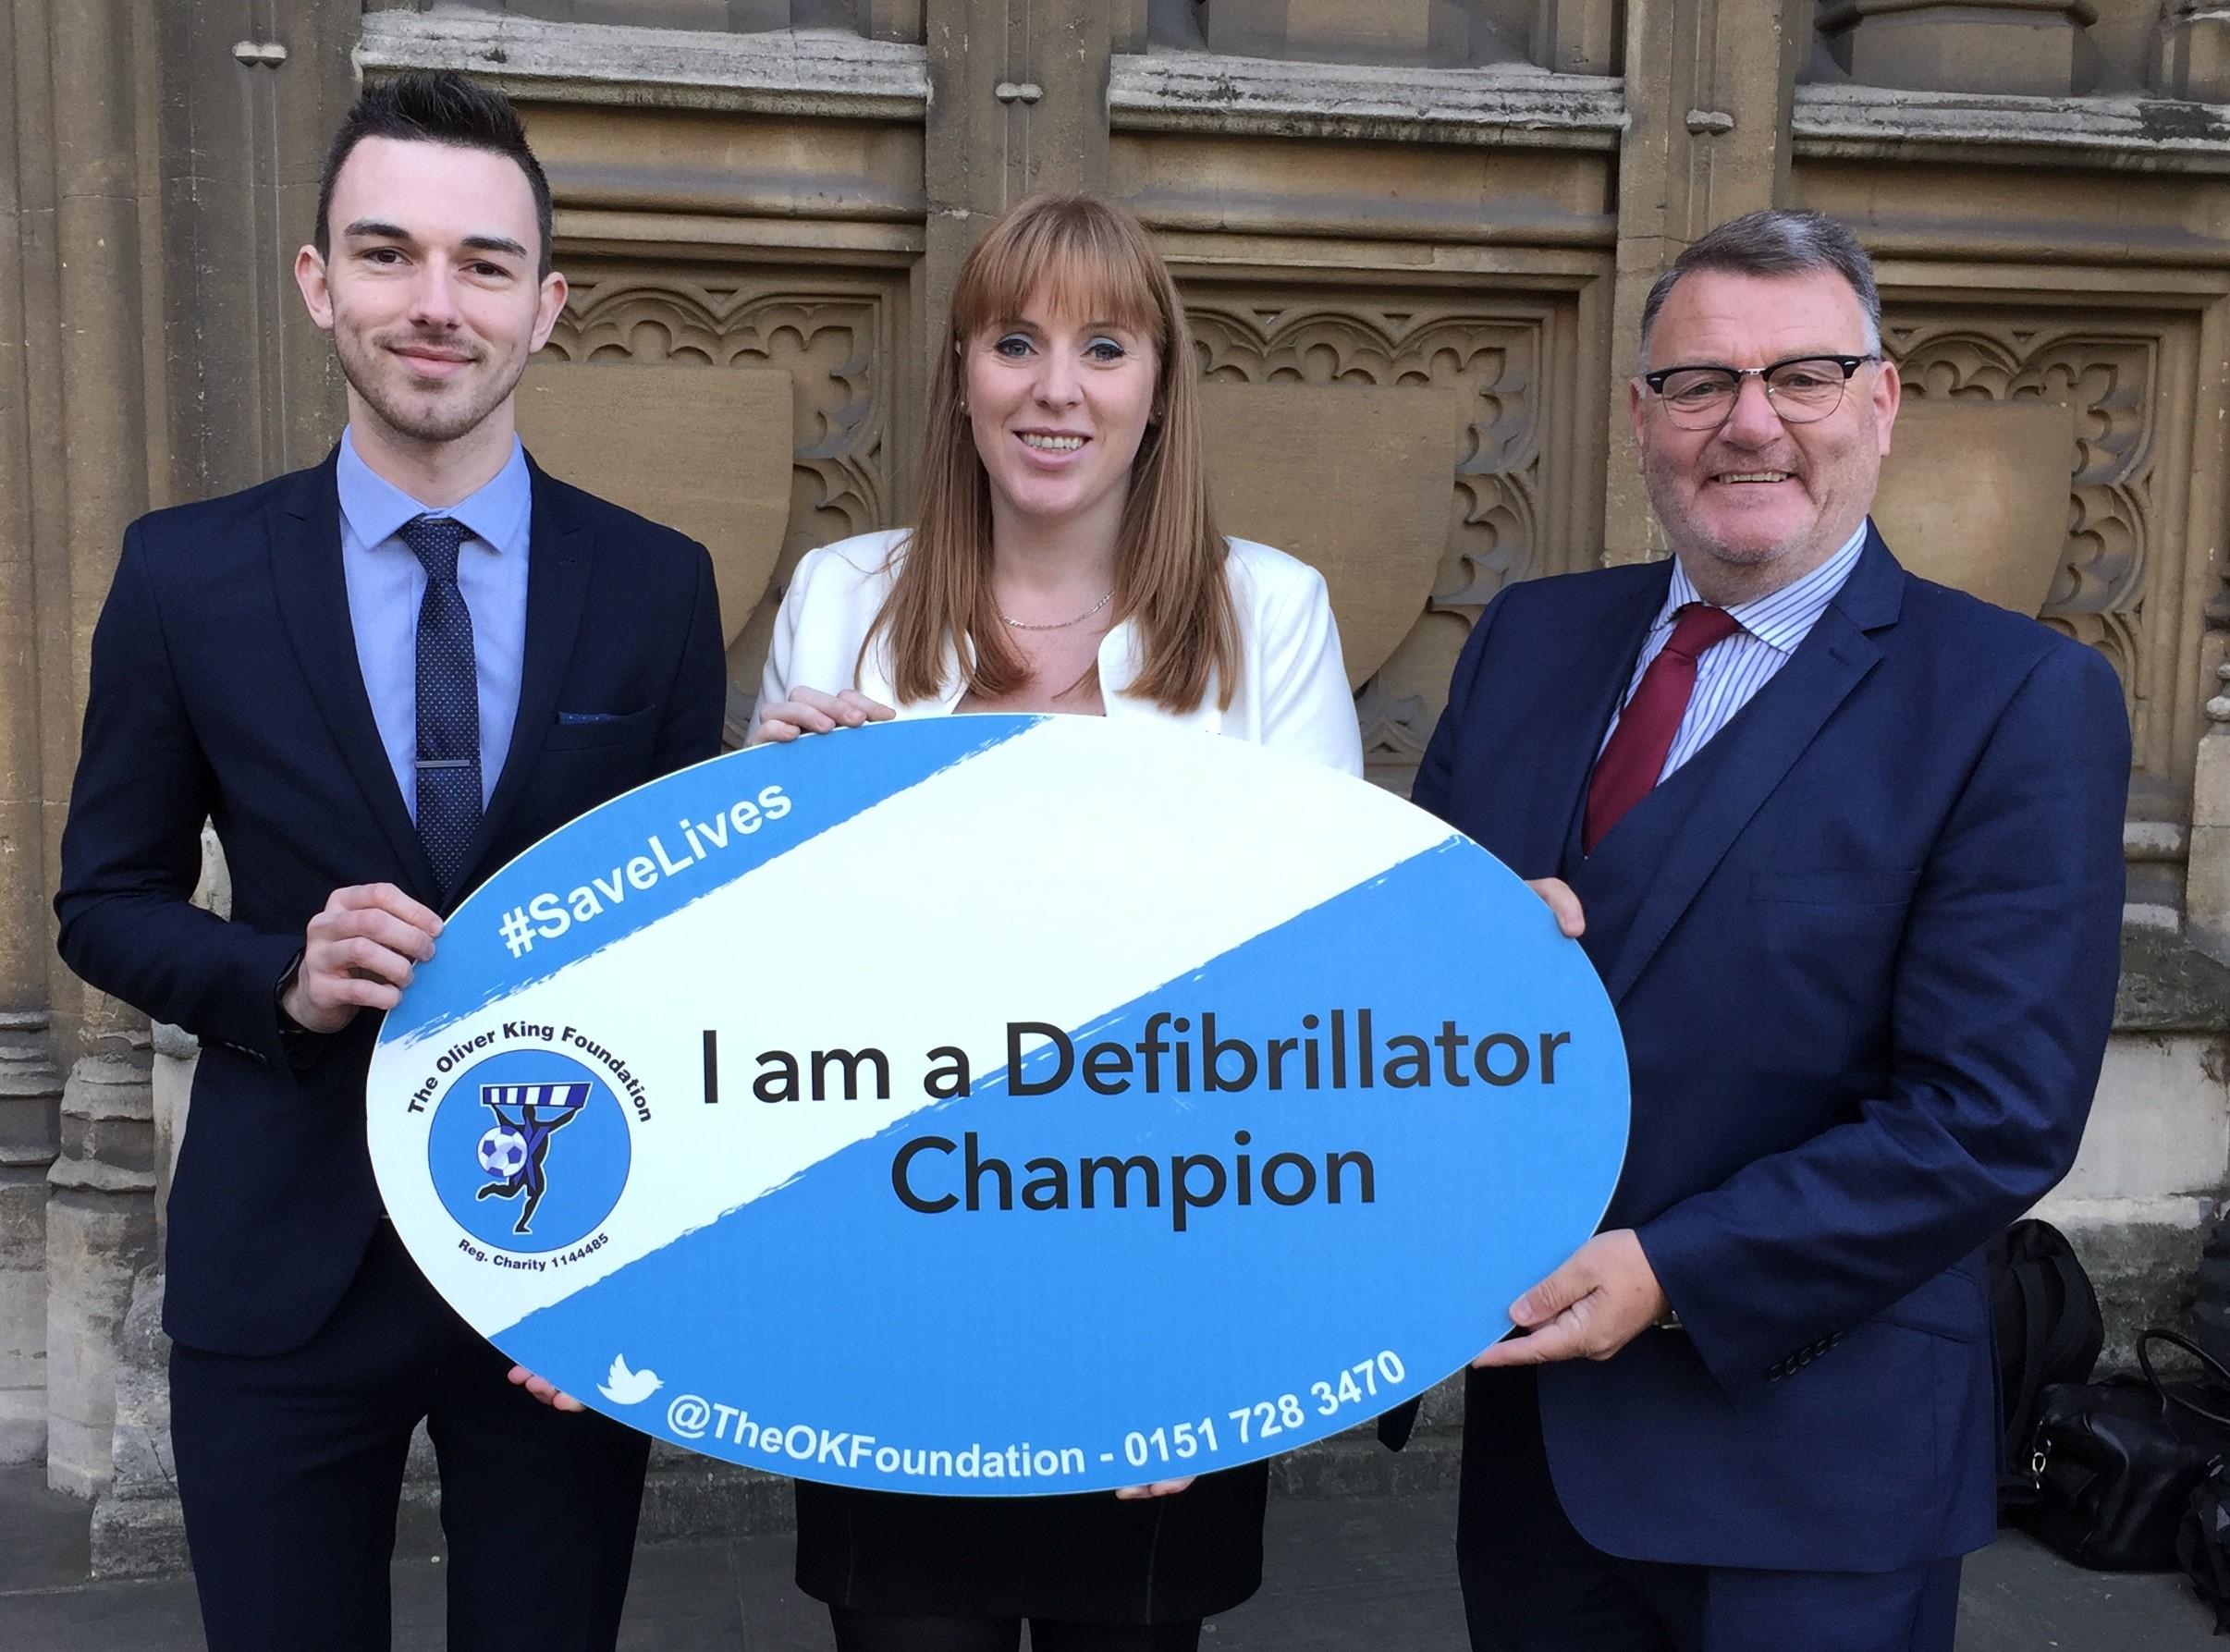 Defibrillator_Champions_-_Angela_Rayner.JPG